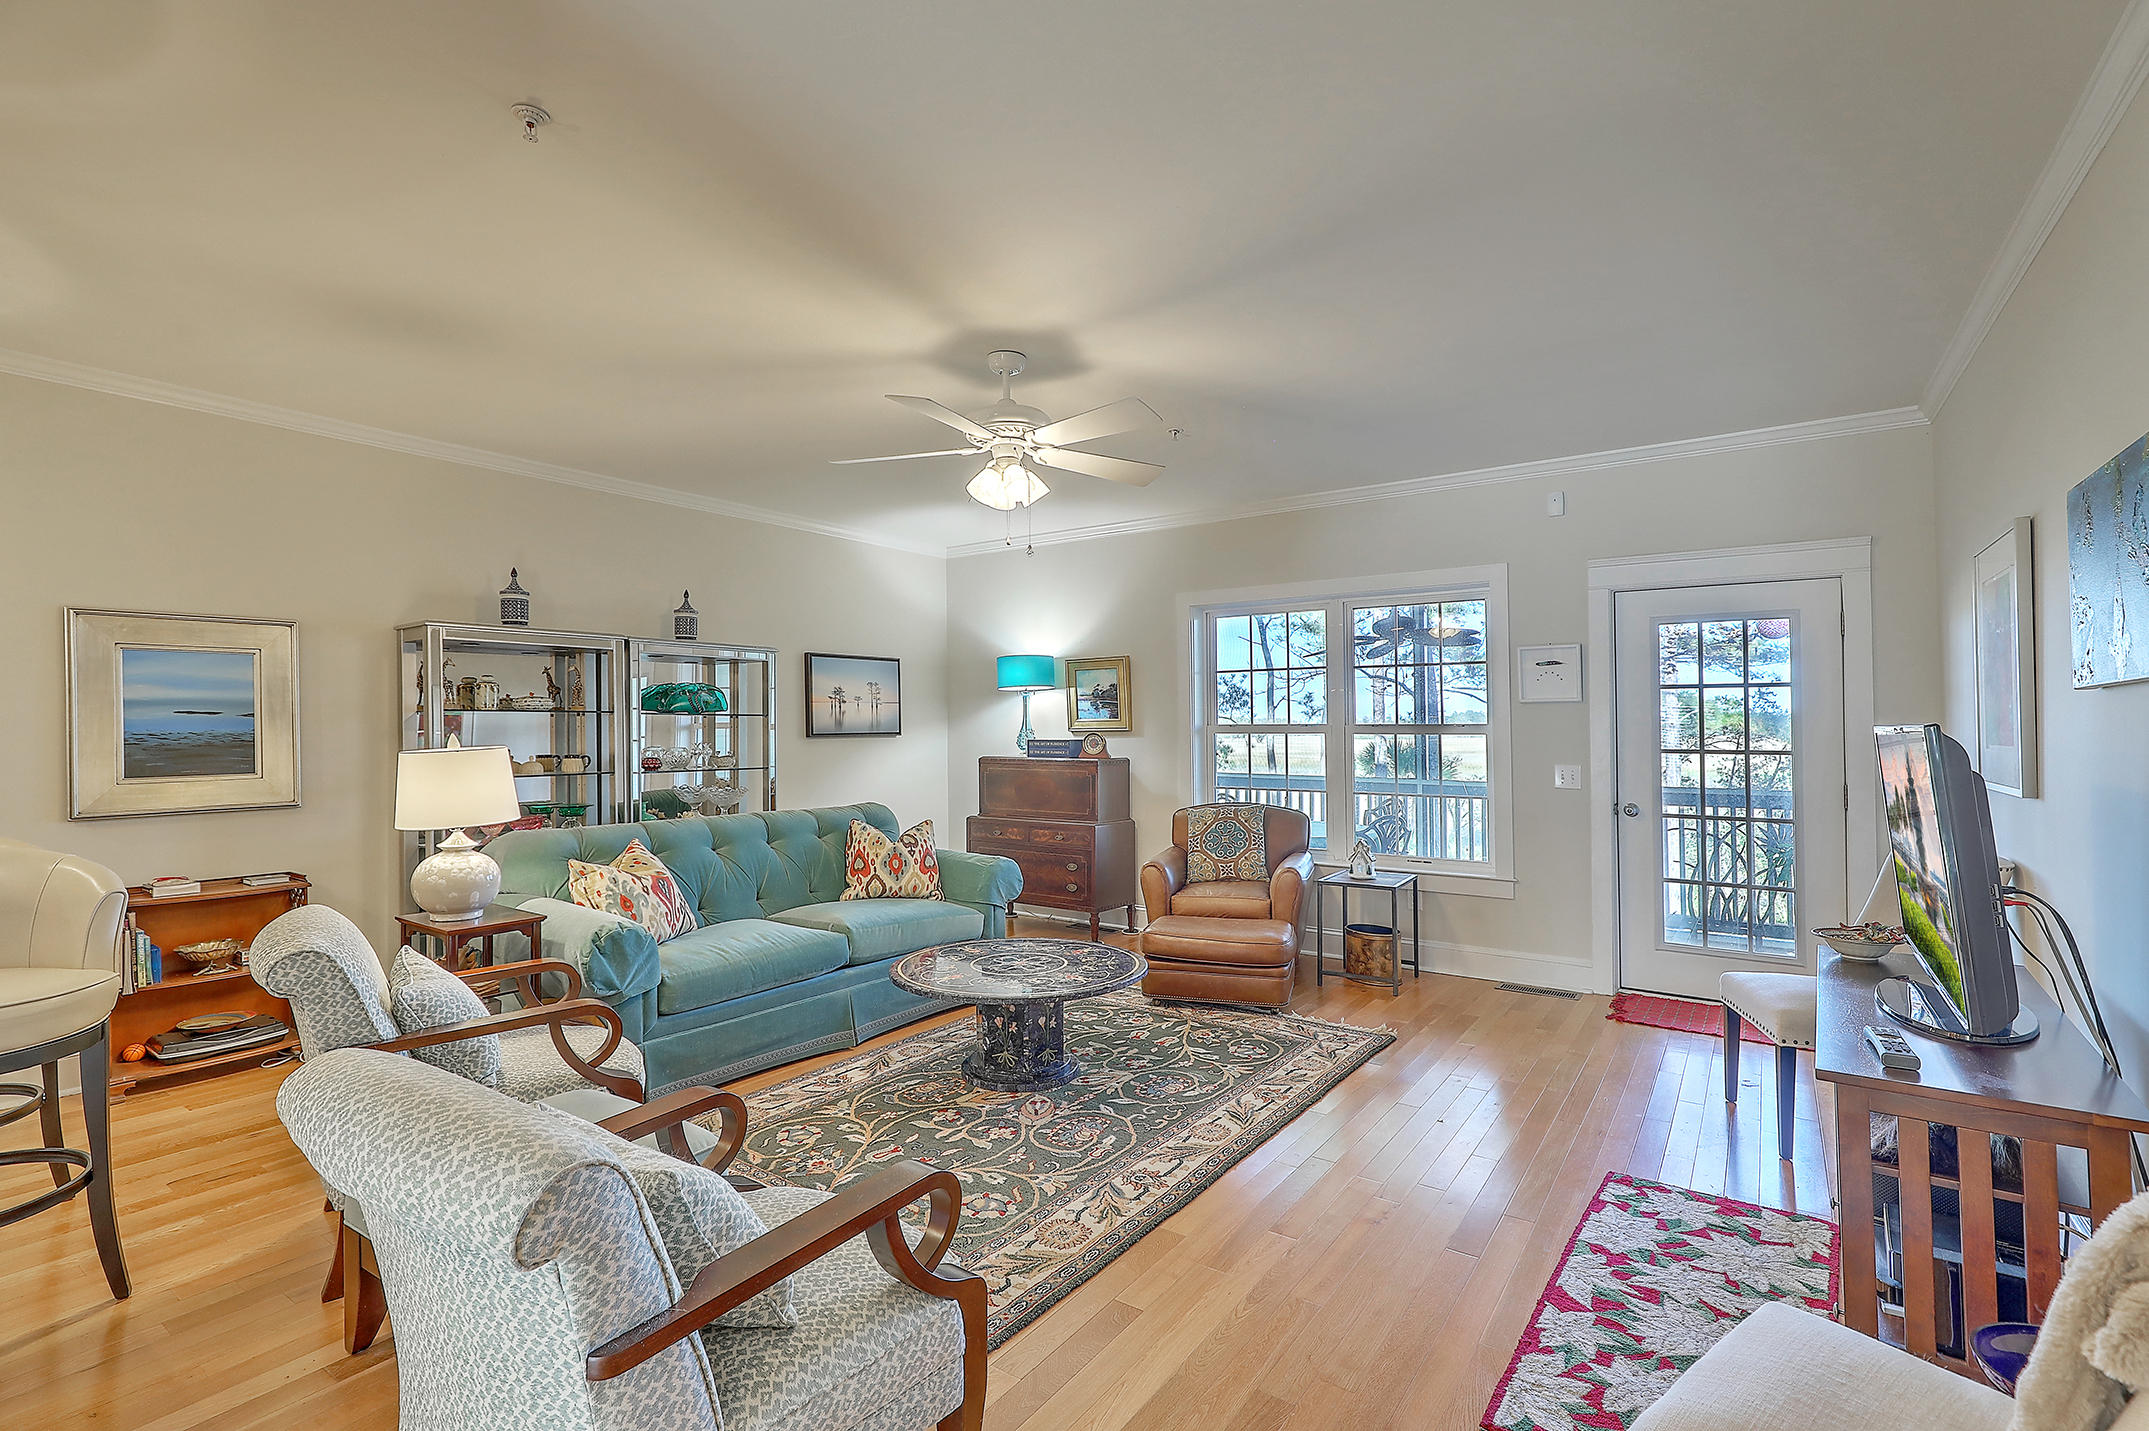 Etiwan Pointe Homes For Sale - 124 Winding Creek, Mount Pleasant, SC - 29